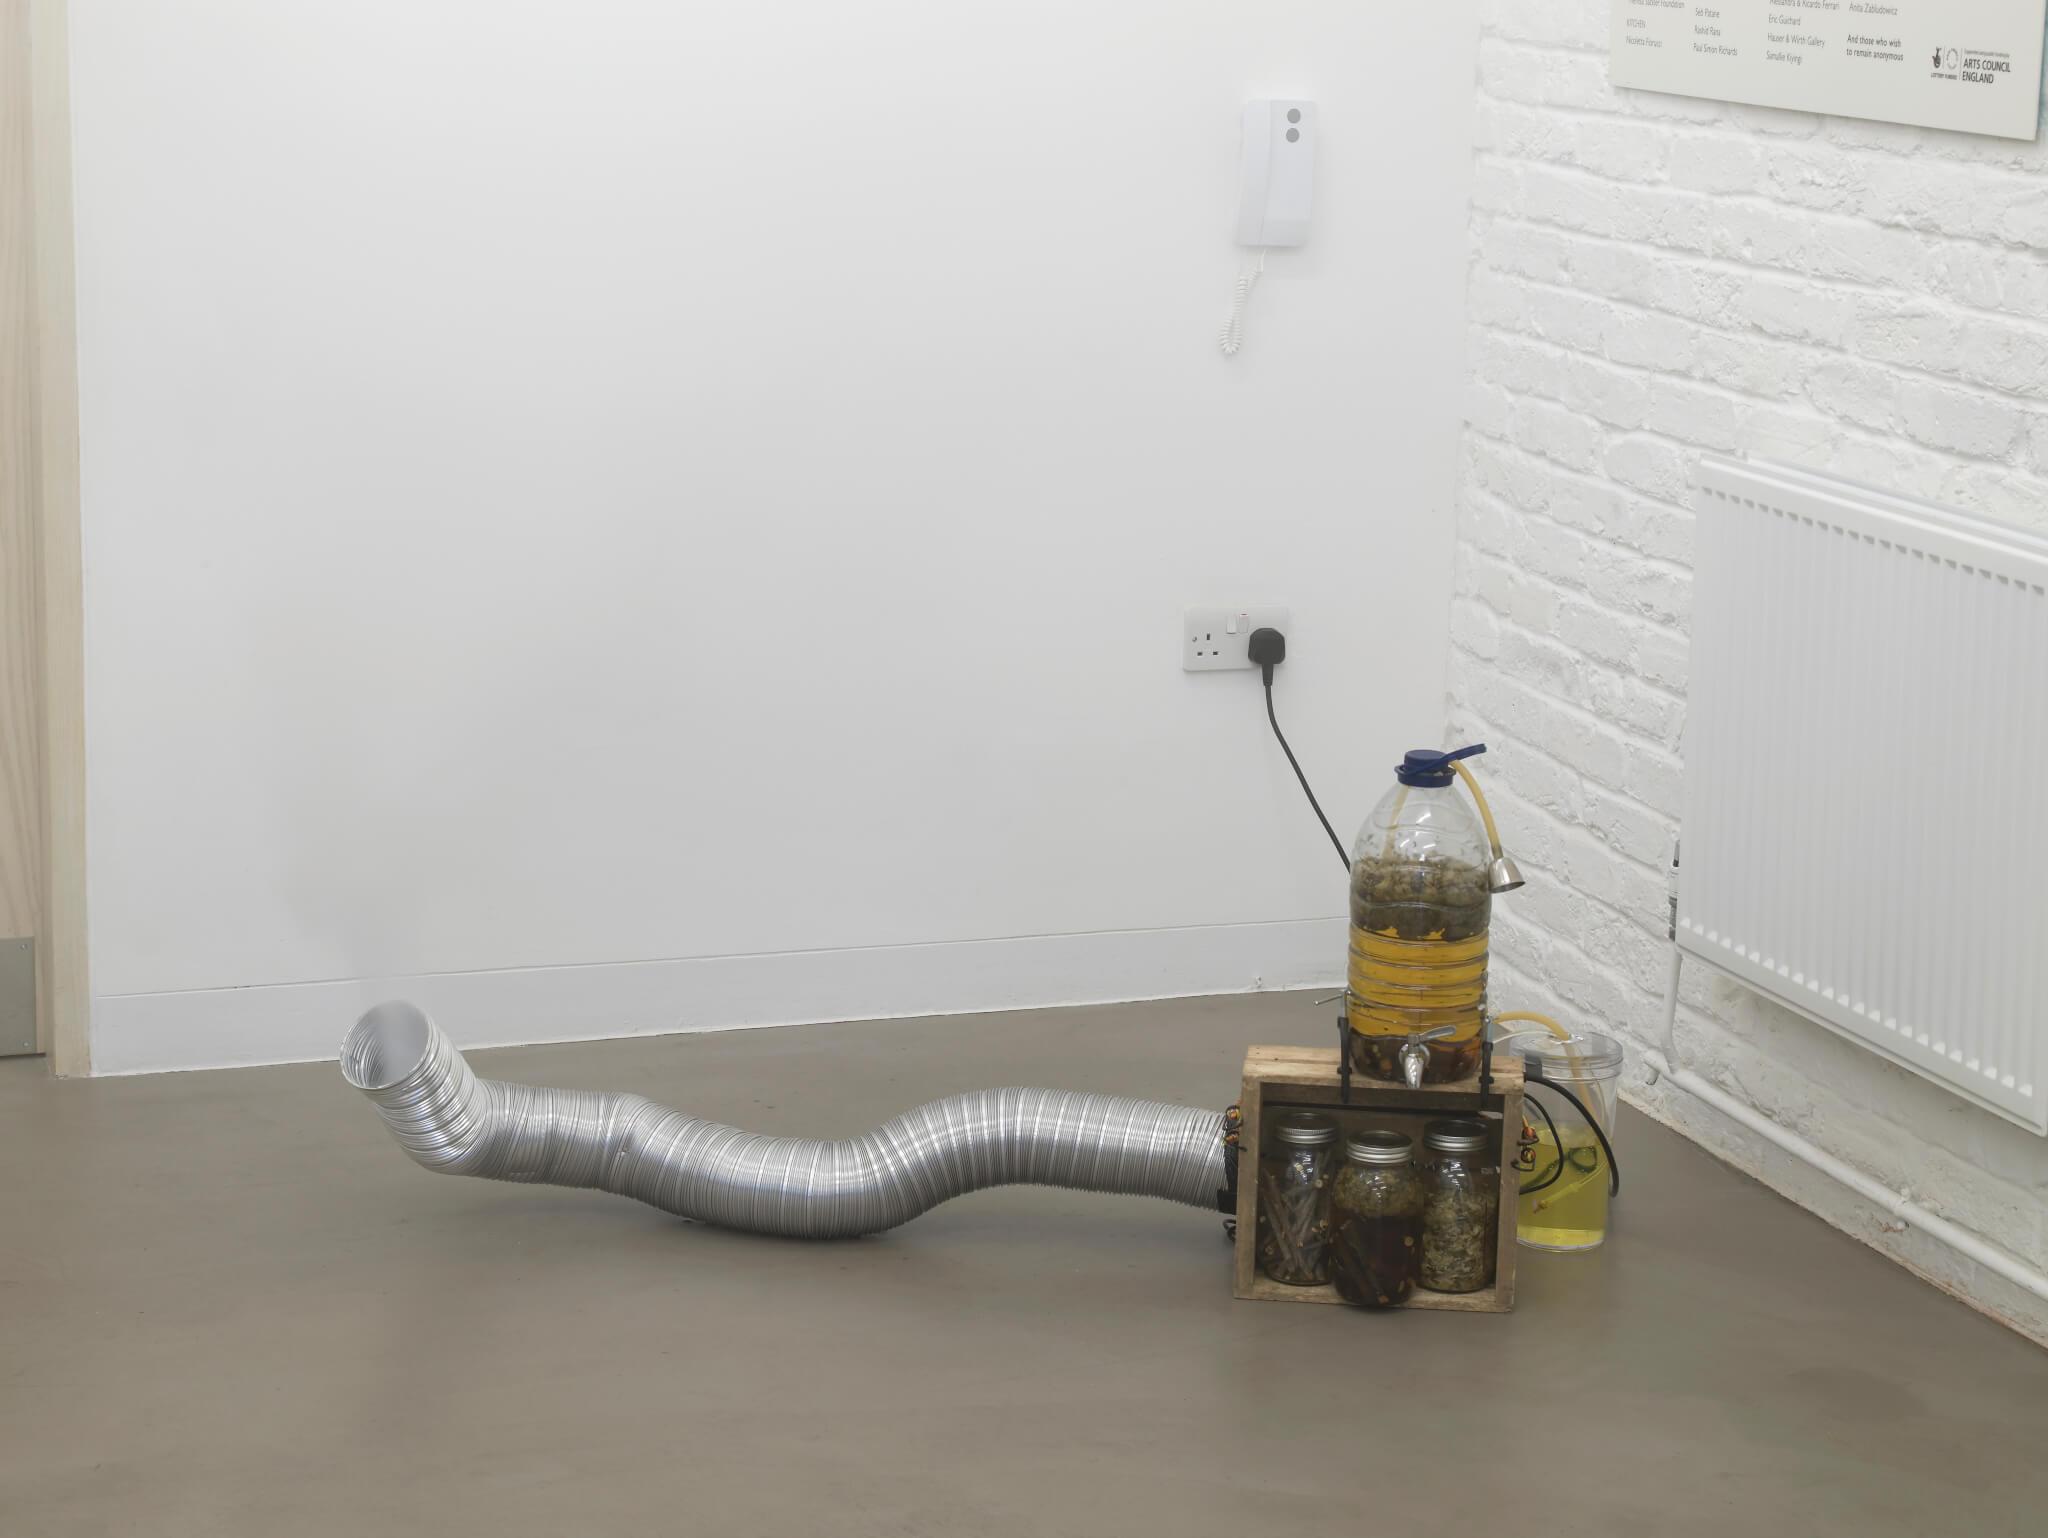 hormonal-fog-machine